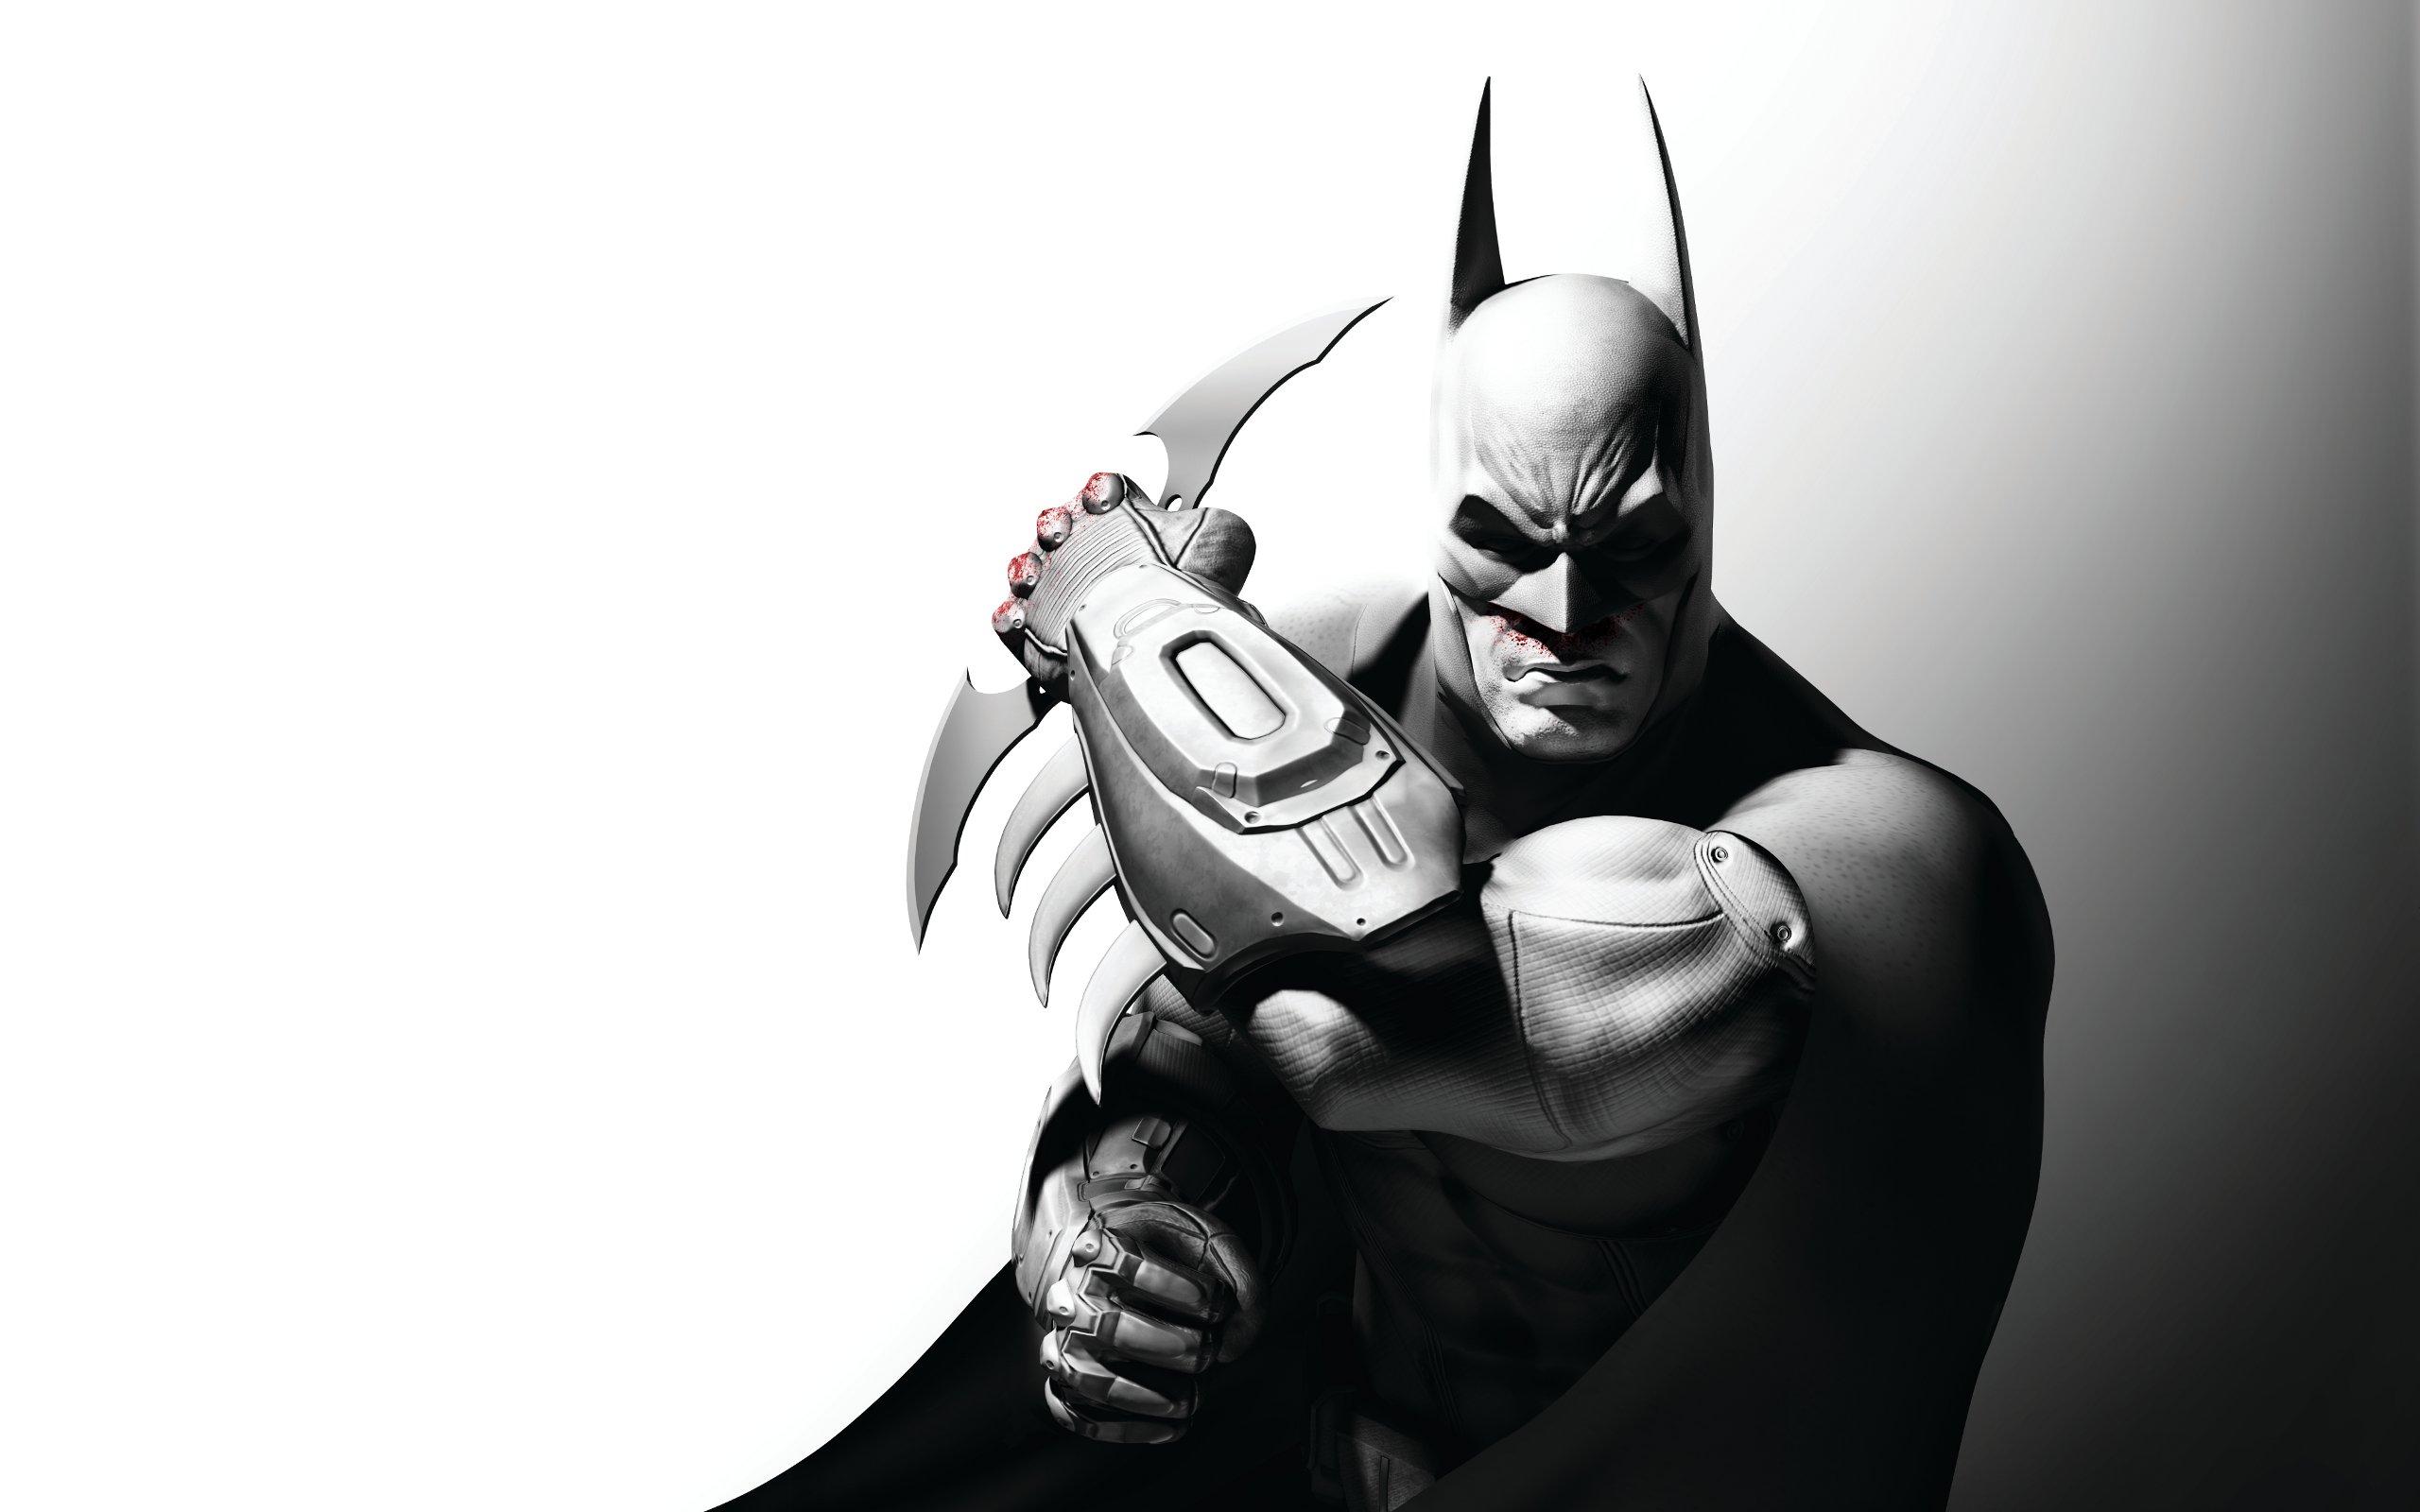 batman: arkham city hd wallpaper | background image | 2560x1600 | id